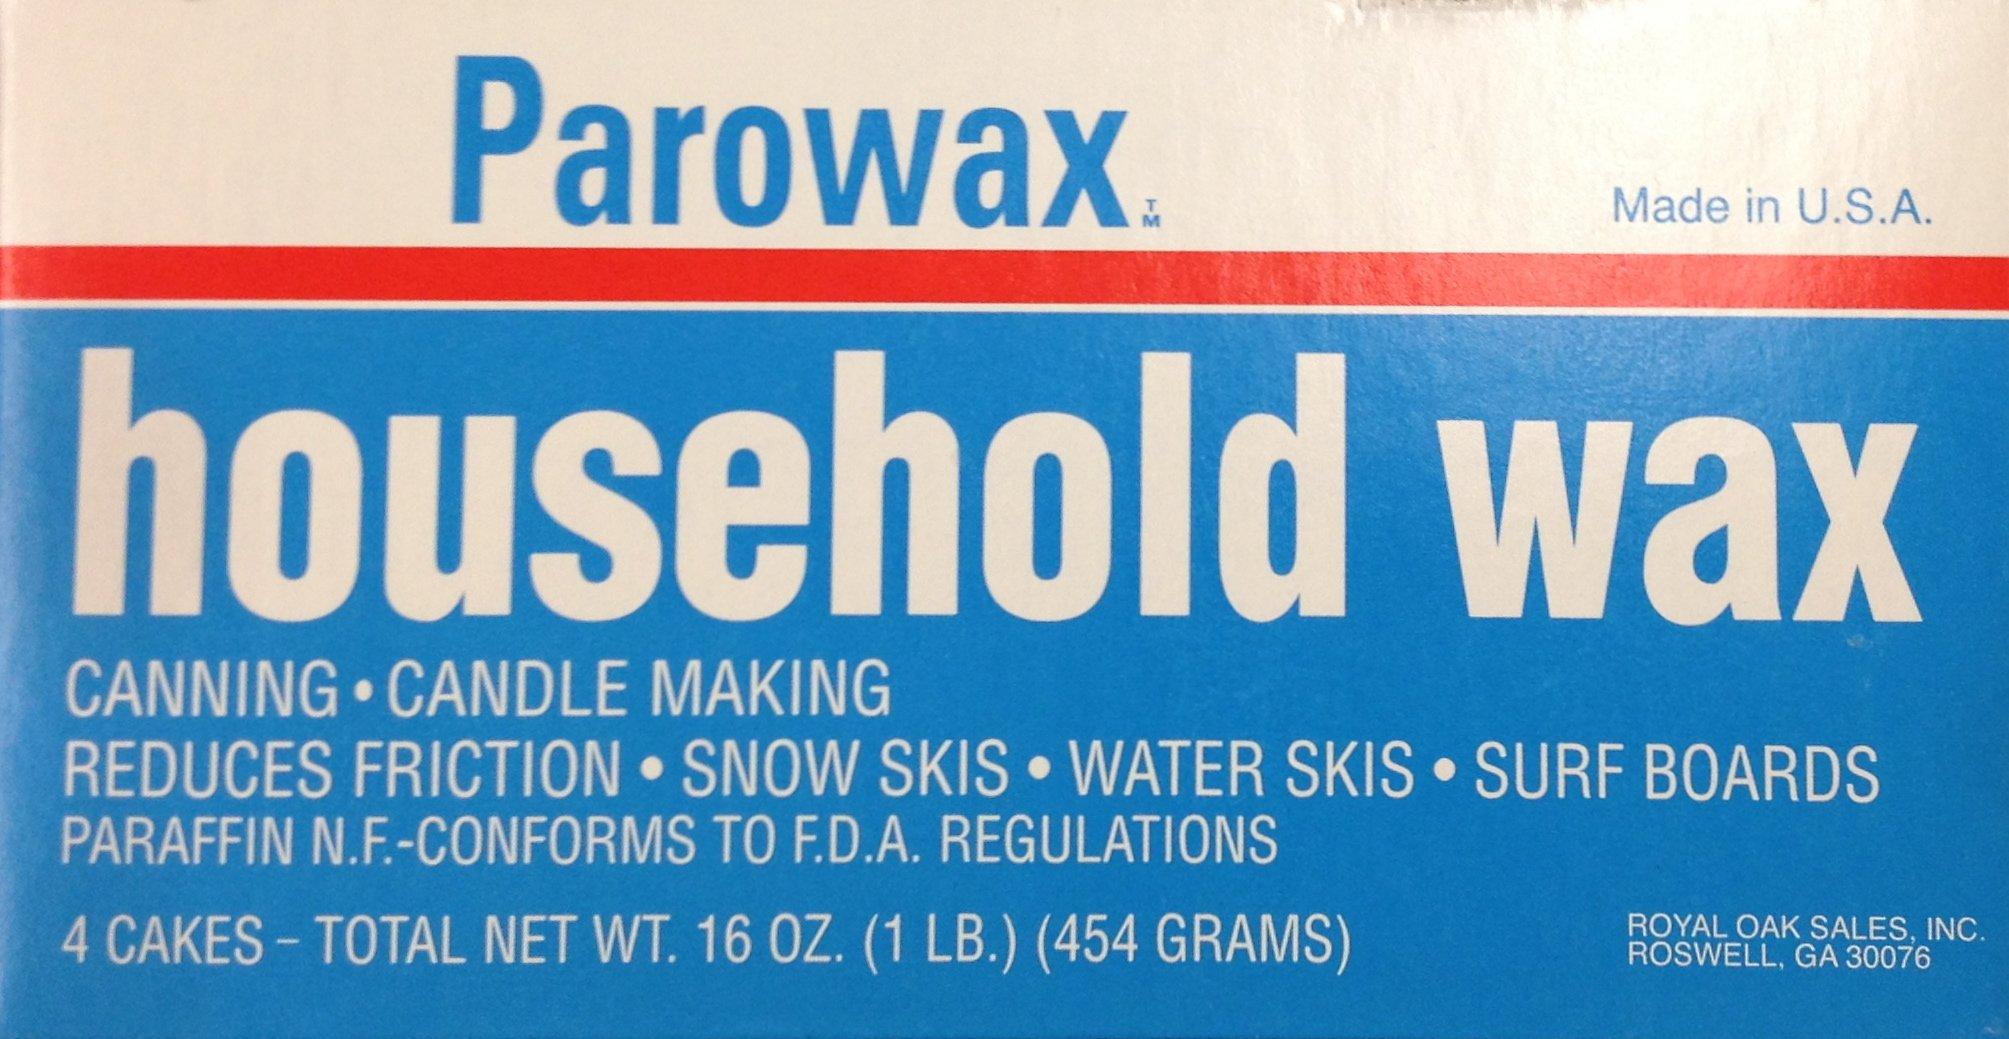 Parowax 24785-8 Household Wax by Parowax